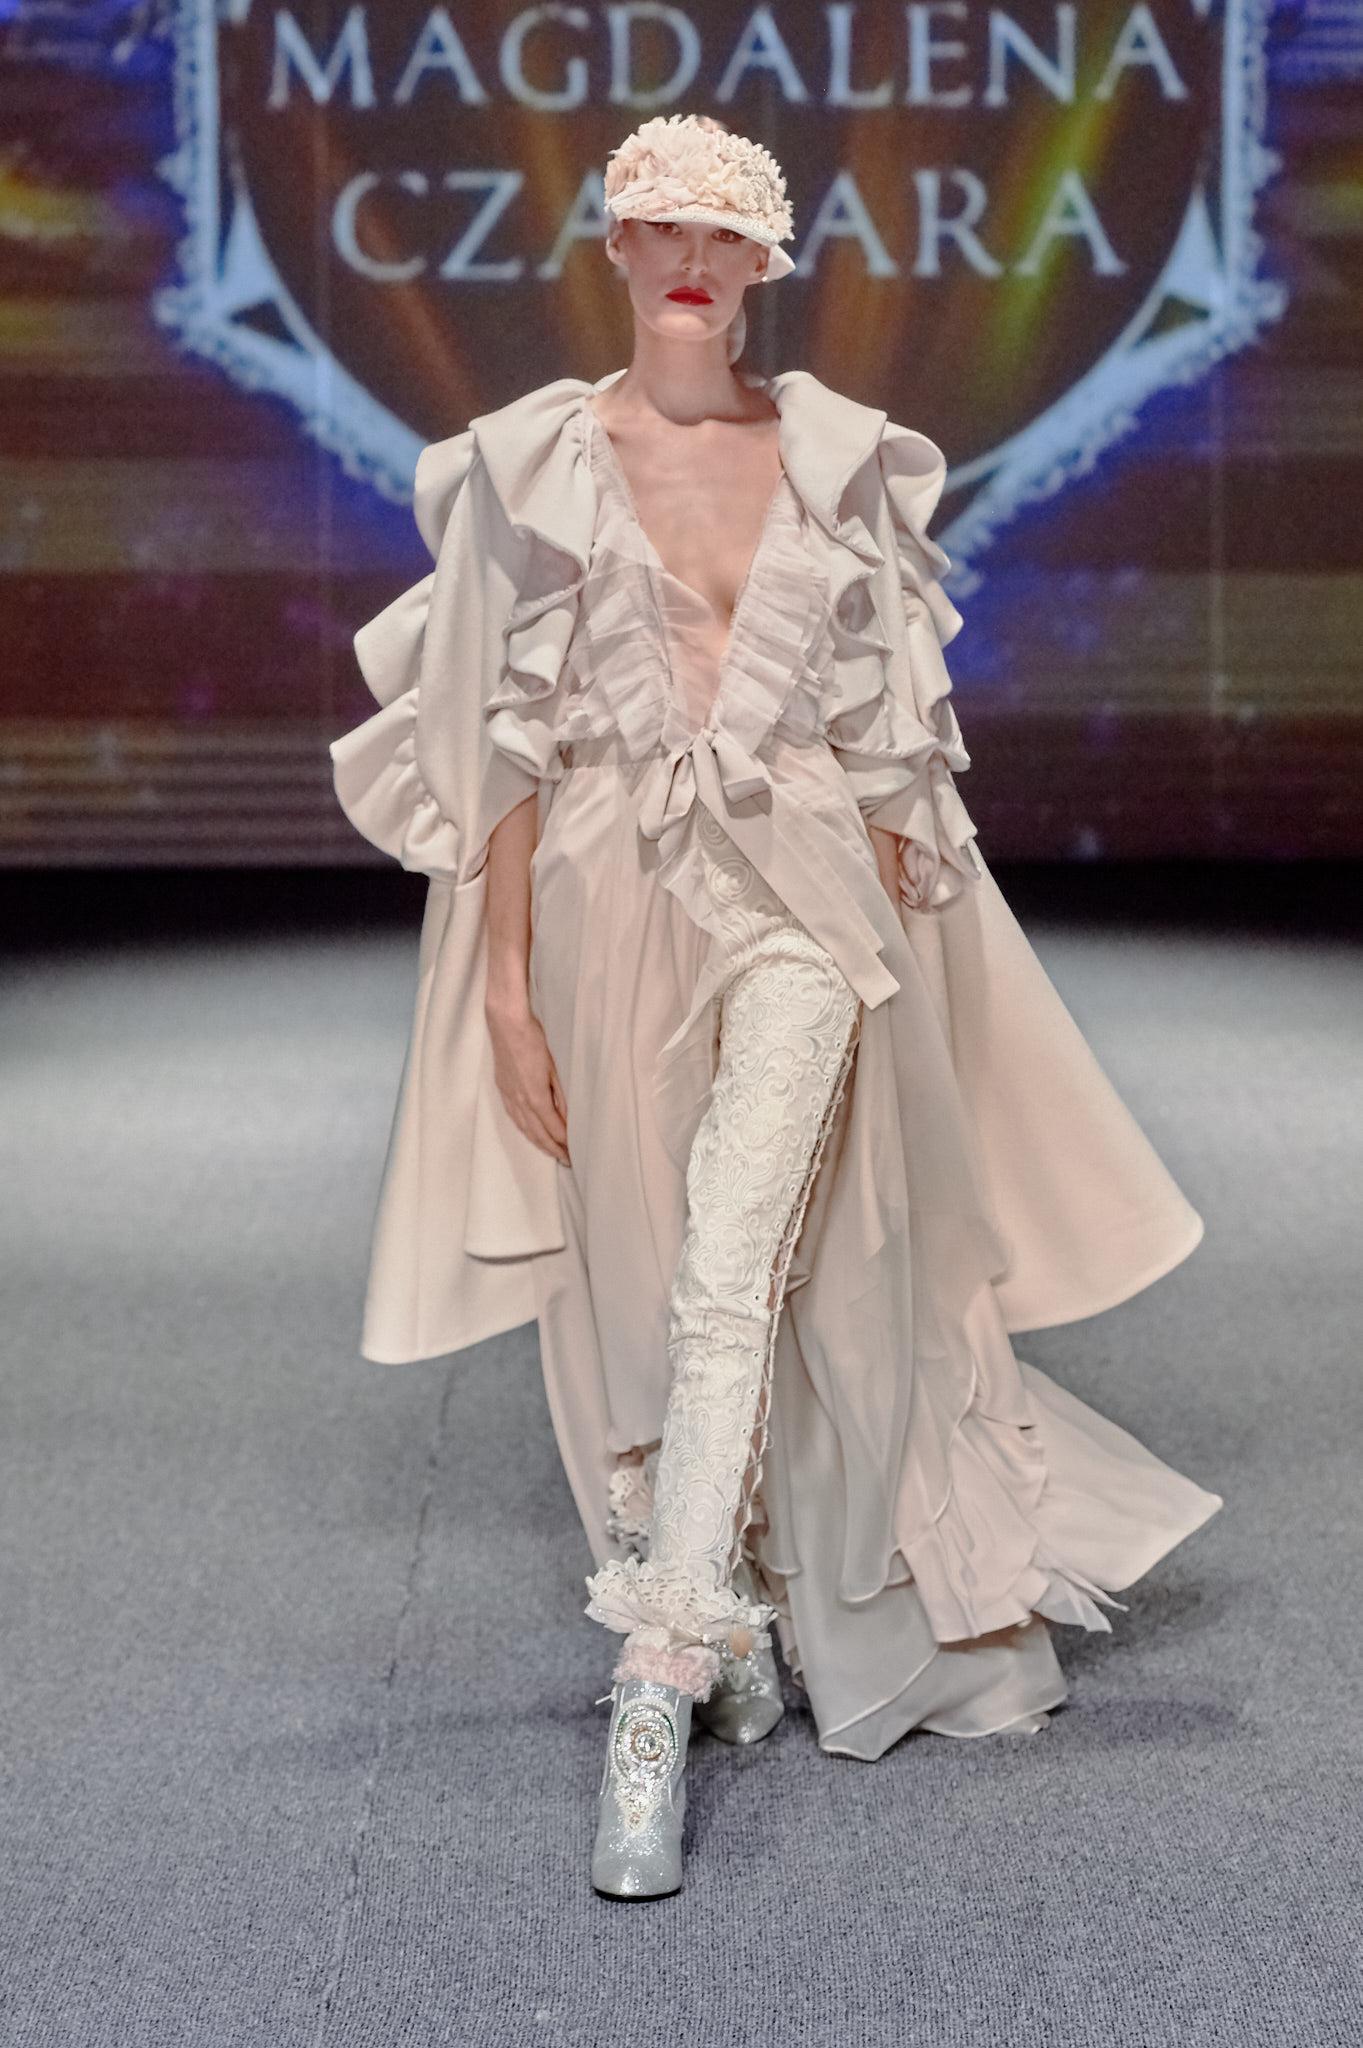 Kolekcja Magdaleny Czamary /fot. Filip Okopny - Fashion Images